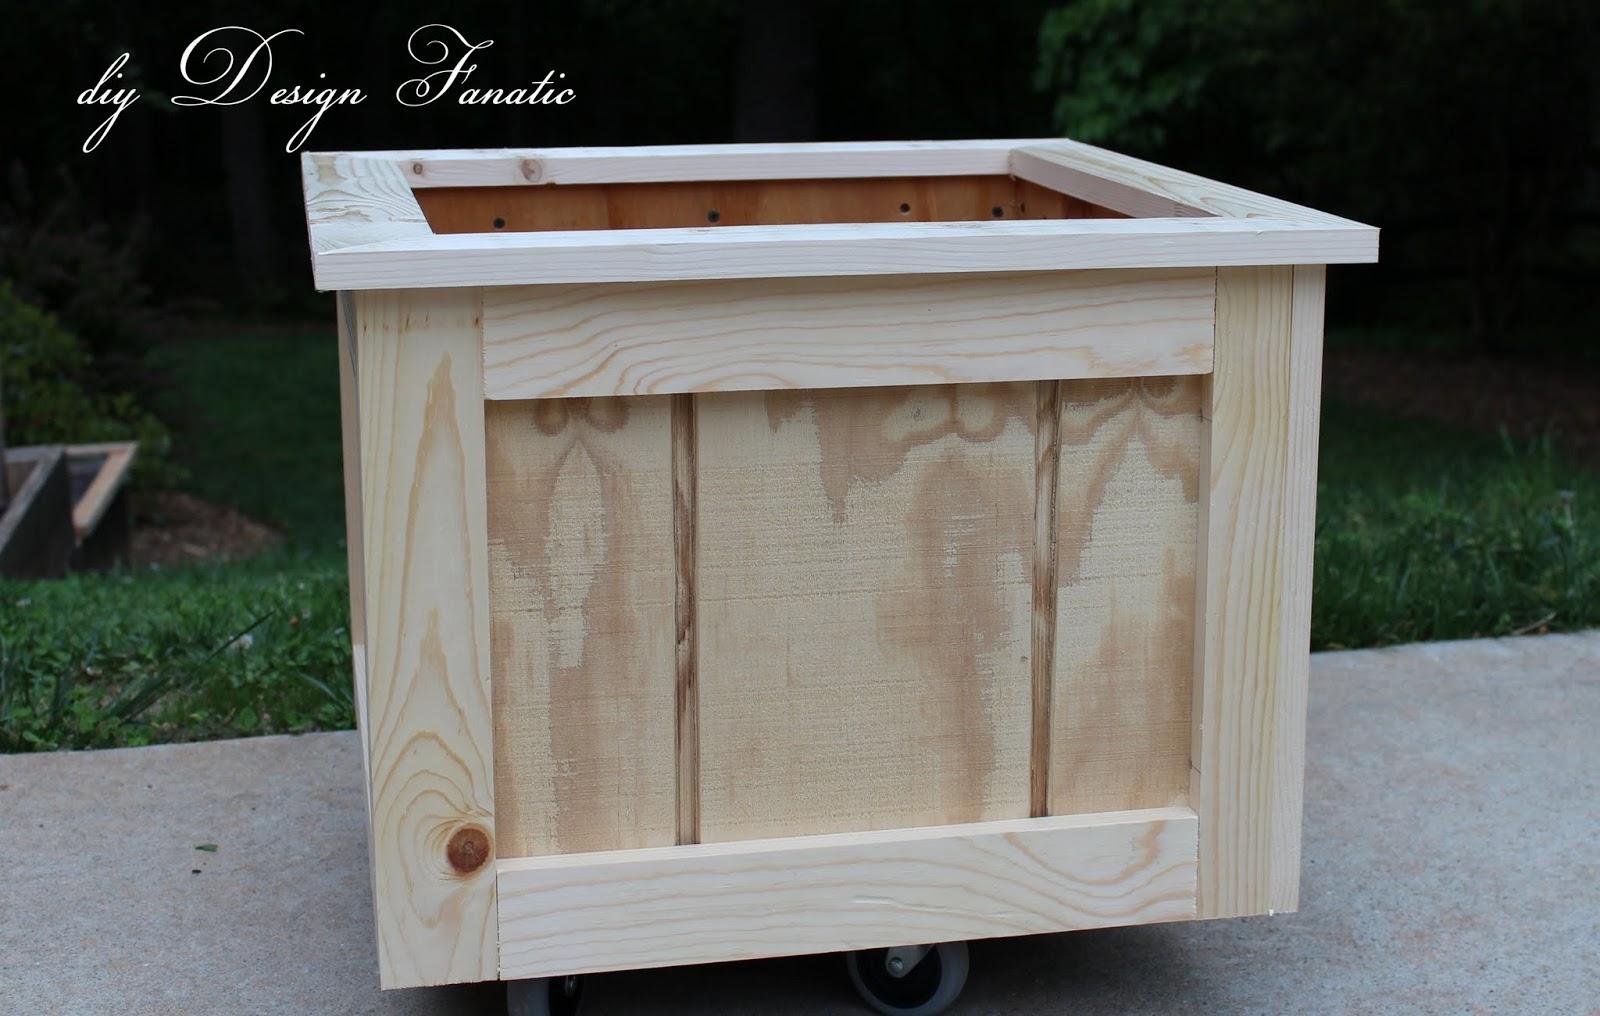 diy design fanatic how to make a wood planter box - Wood Planter Box